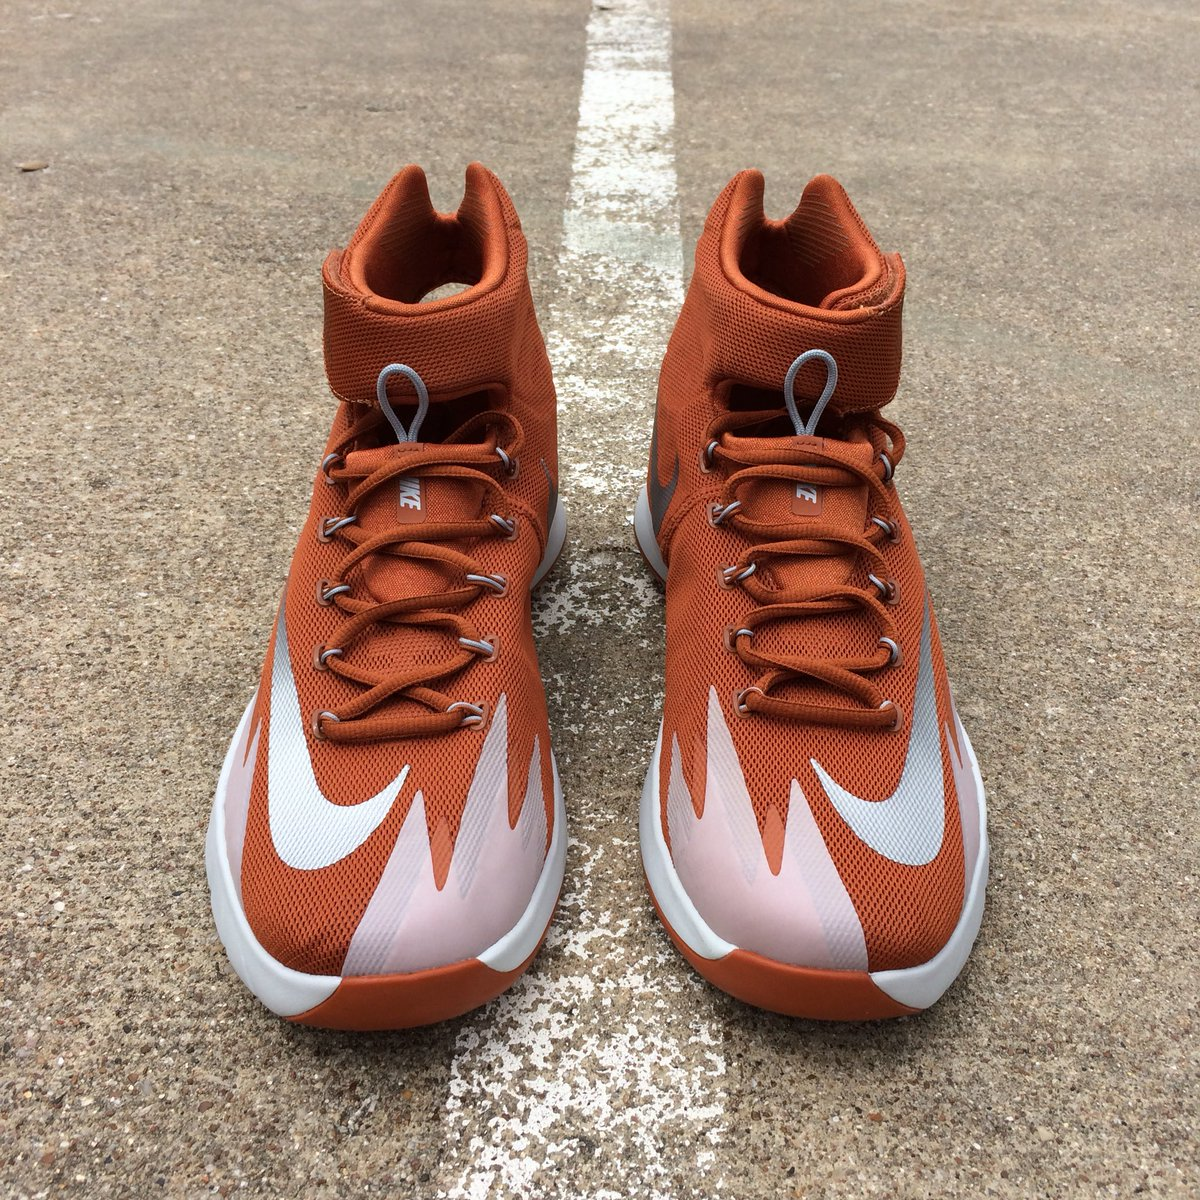 buy online de975 2af0b Nike Zoom HyperRev Team in burnt orange. Worn by  TexasMBB for the second  half of the 2013-2014 season and post season.